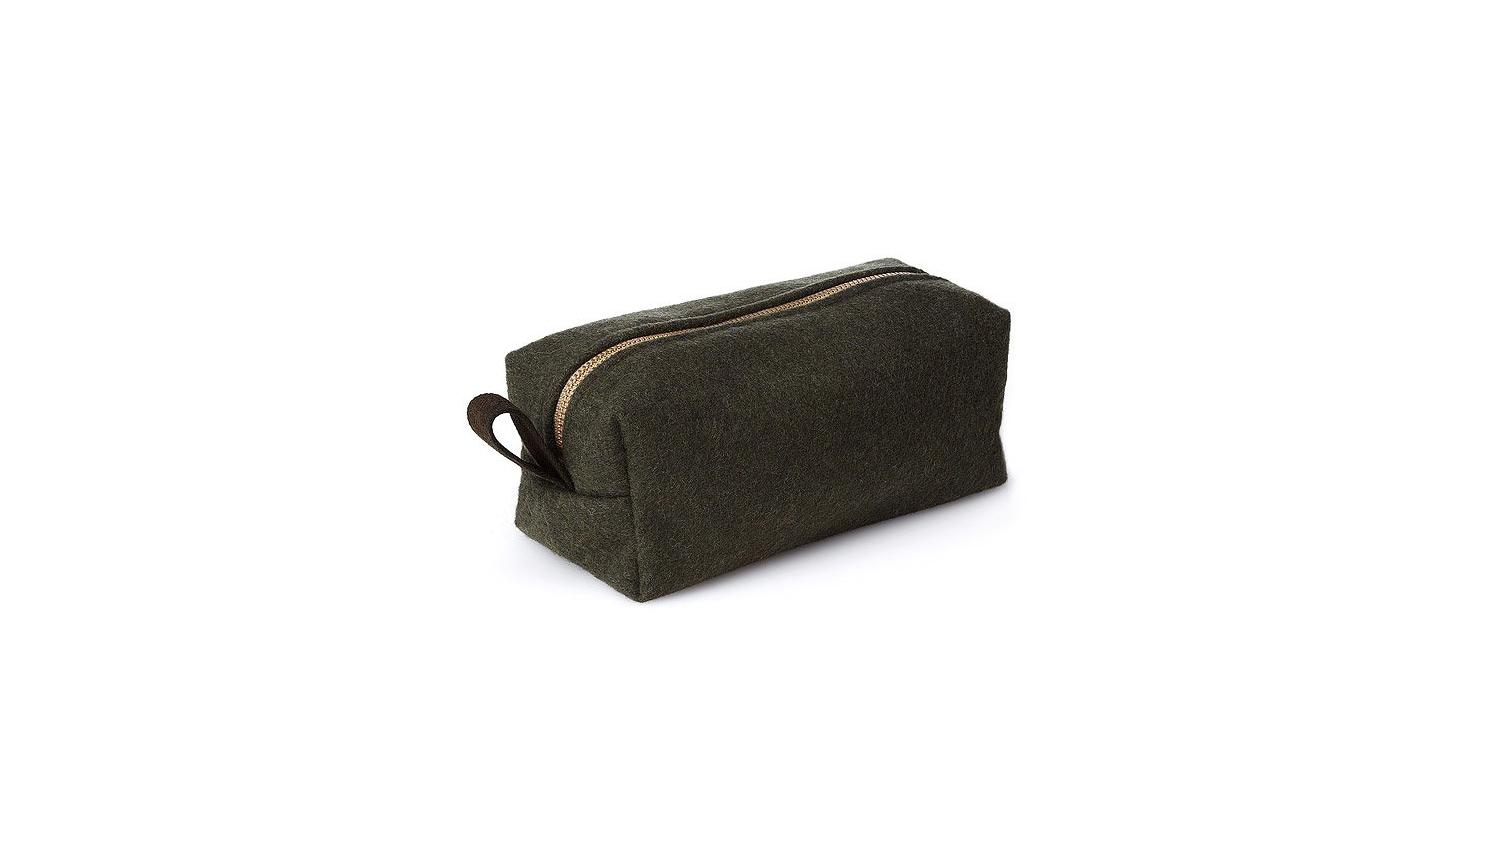 wool anniversary gift black toiletry bag